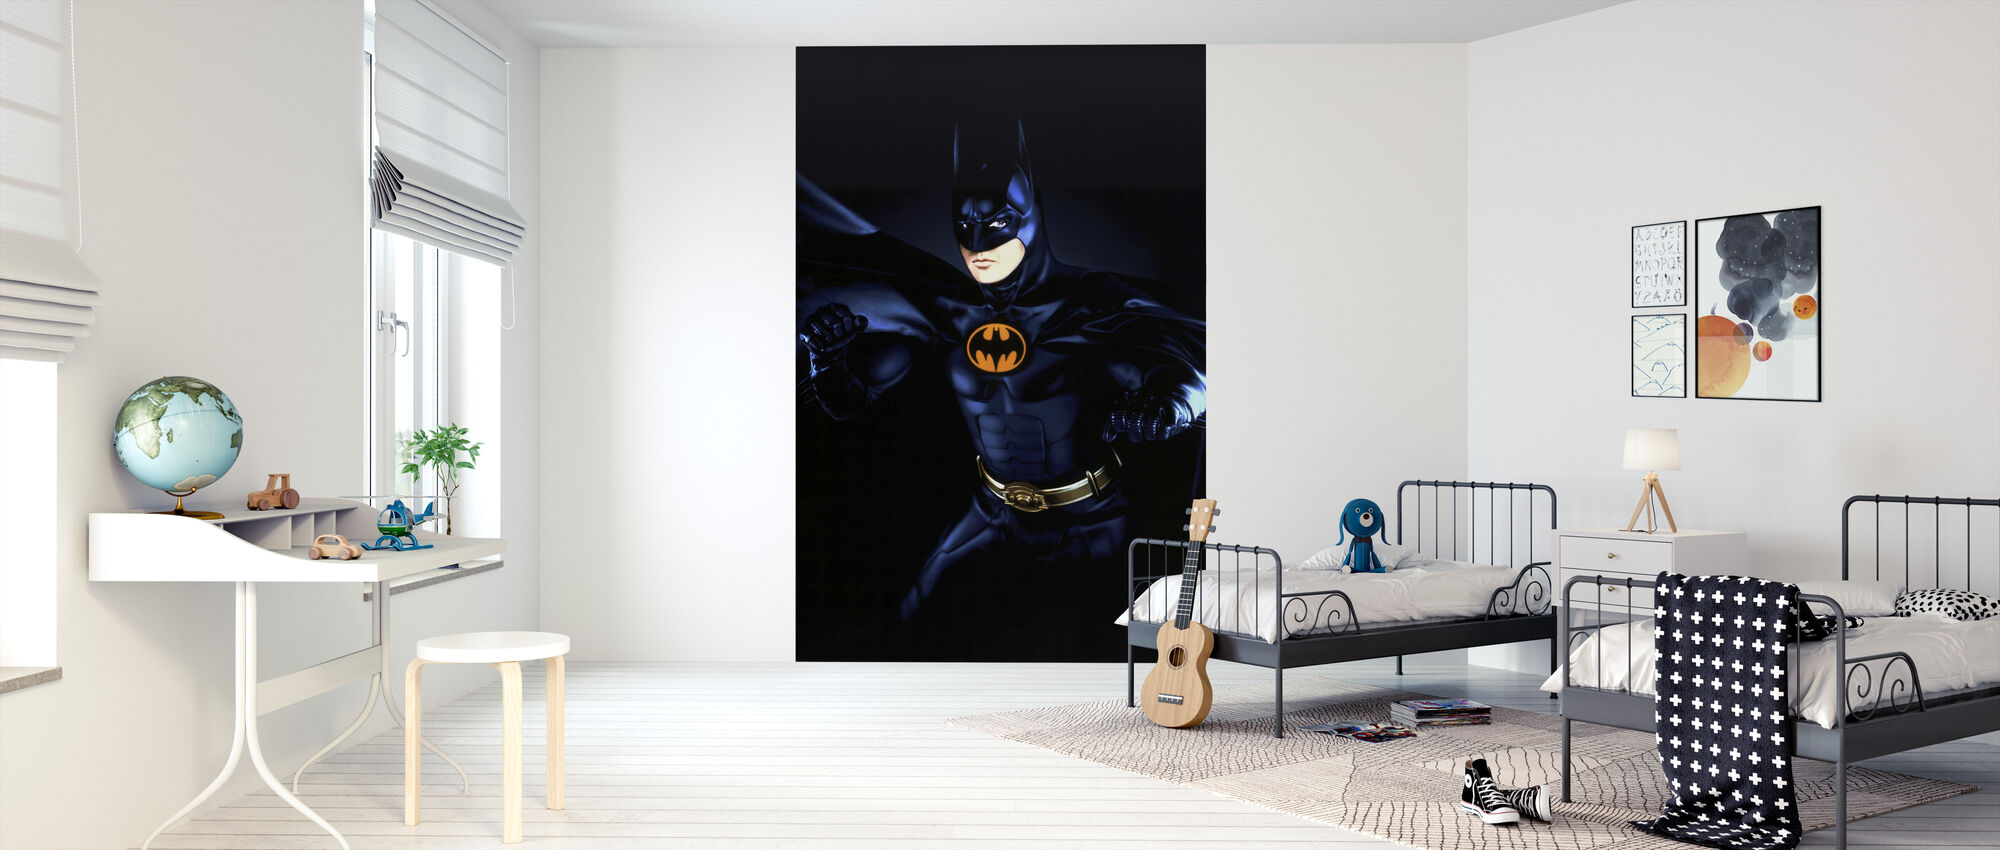 Michael Keaton in Batman Returns - Wallpaper - Kids Room